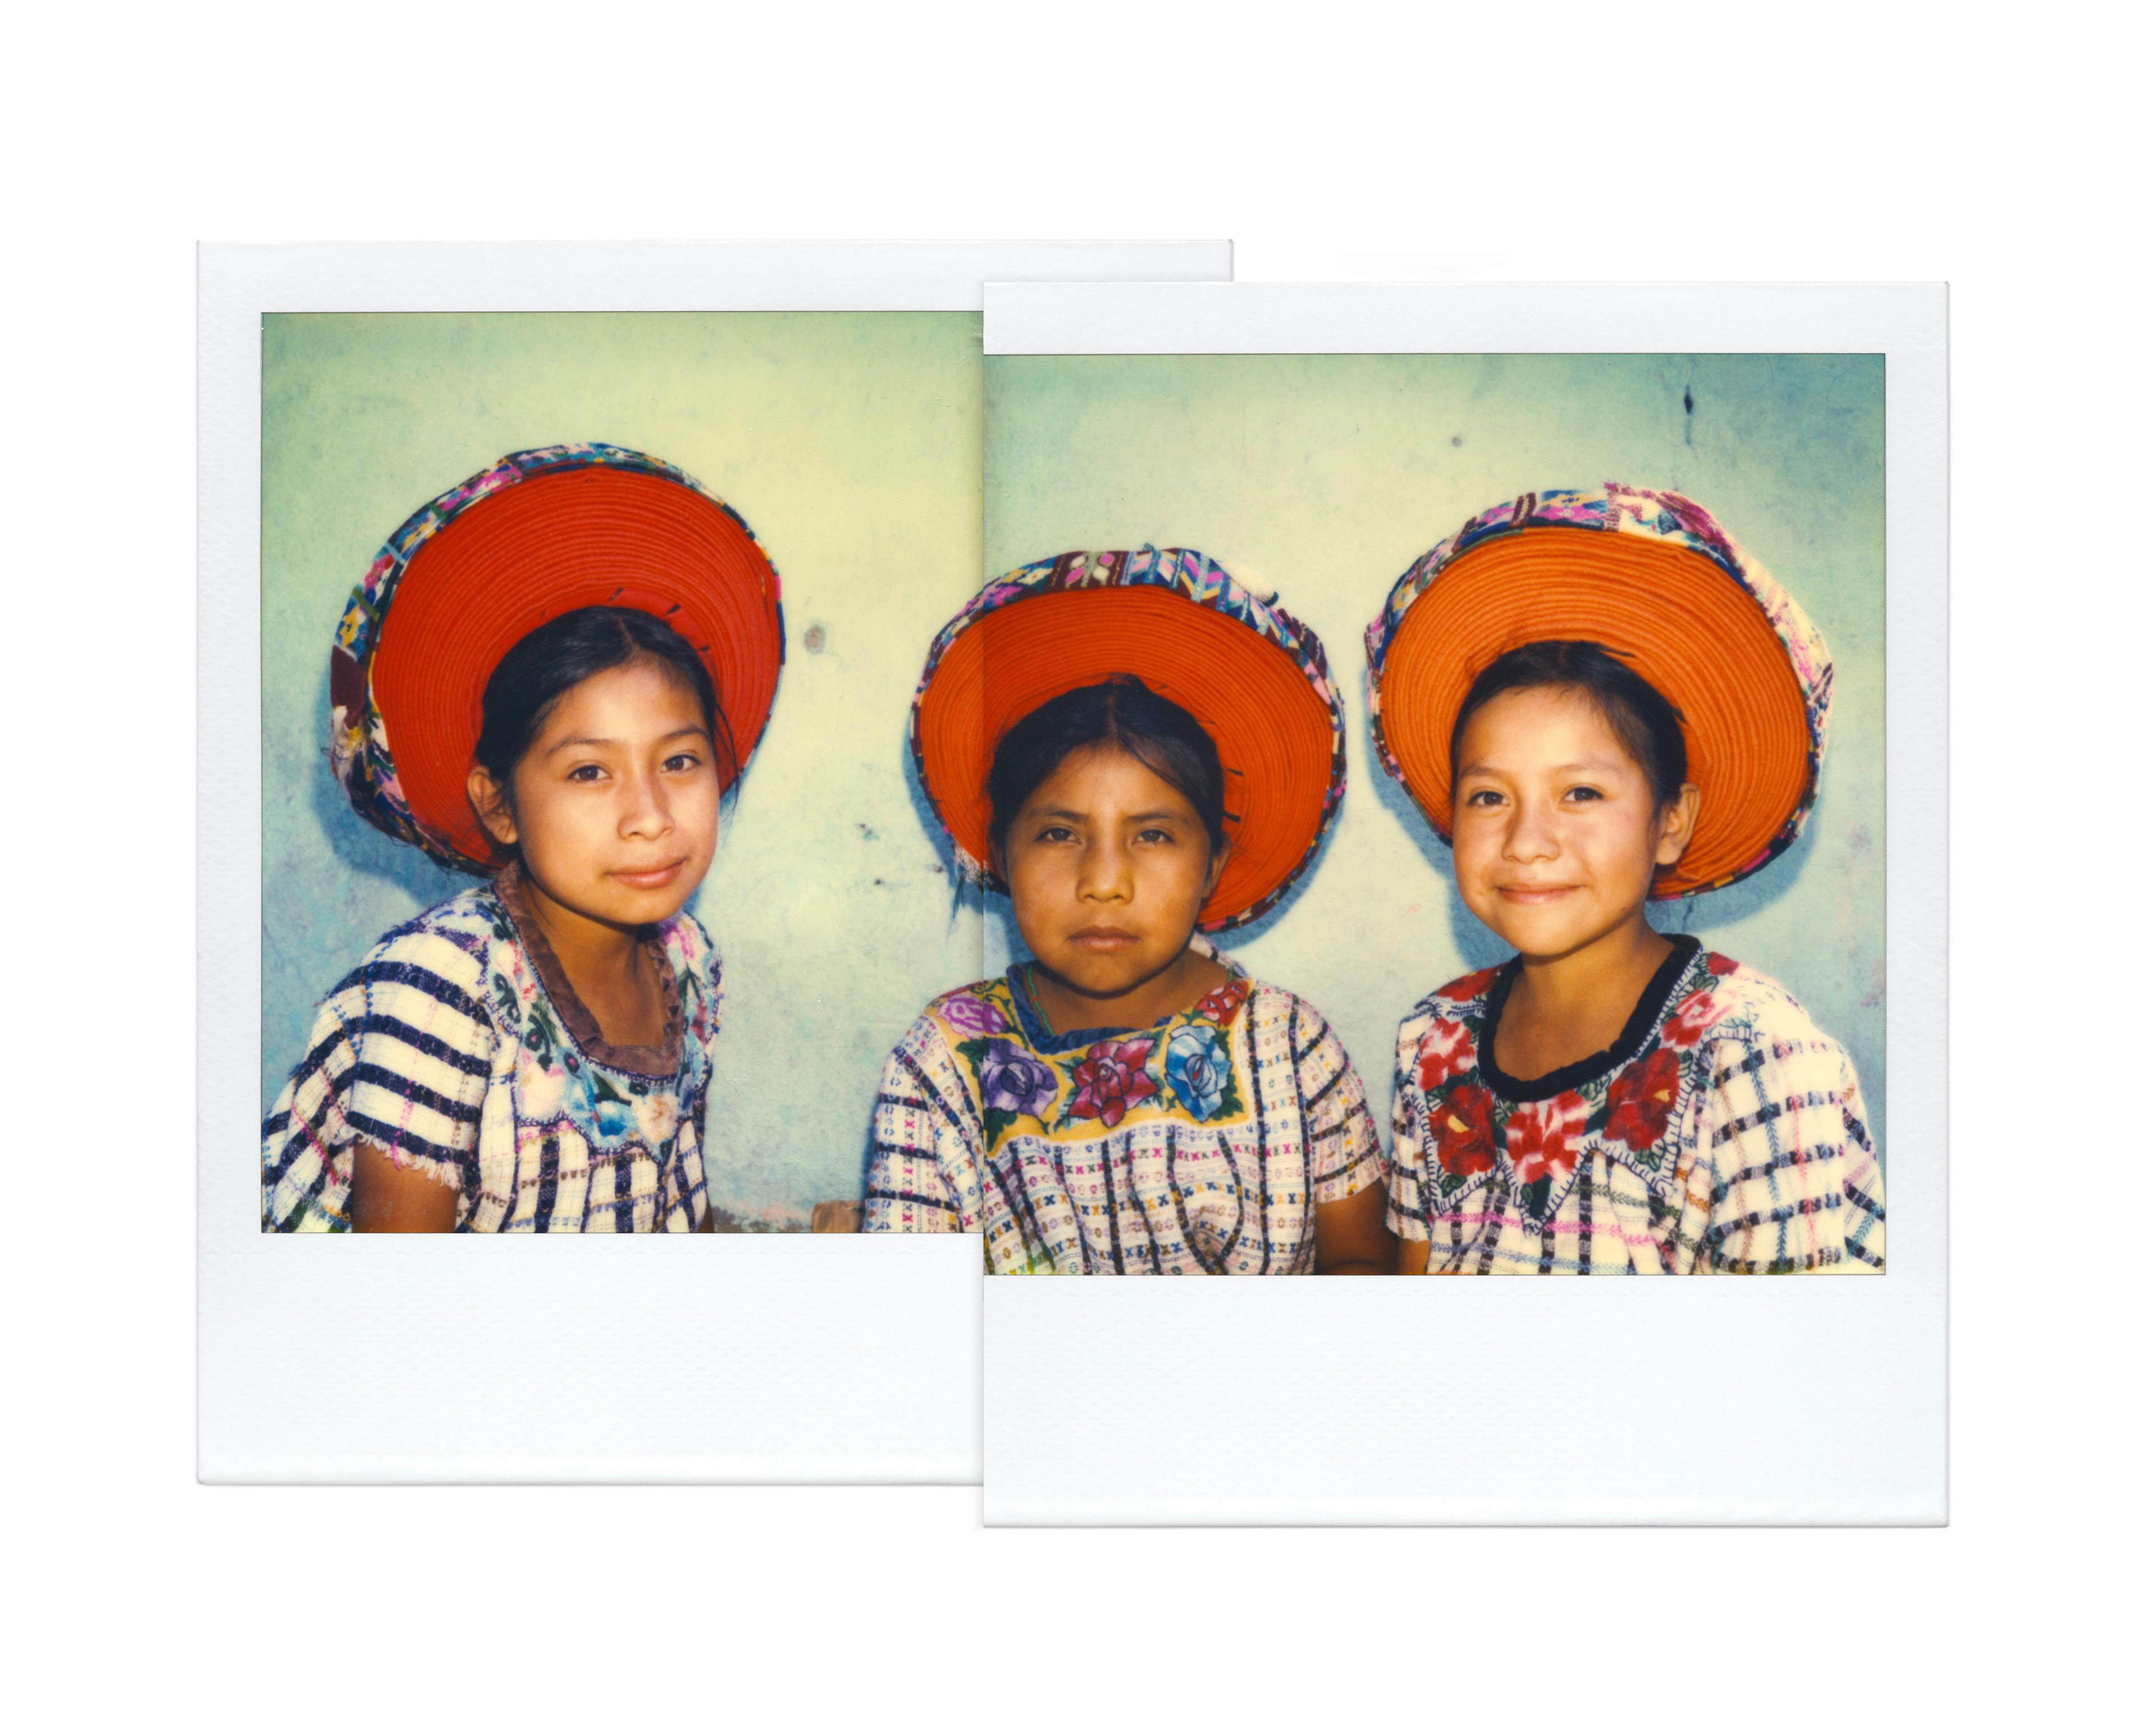 artwork Three young lasses, Santiago Aitlàn, Guatemala, 1980 by Ivo von Renner